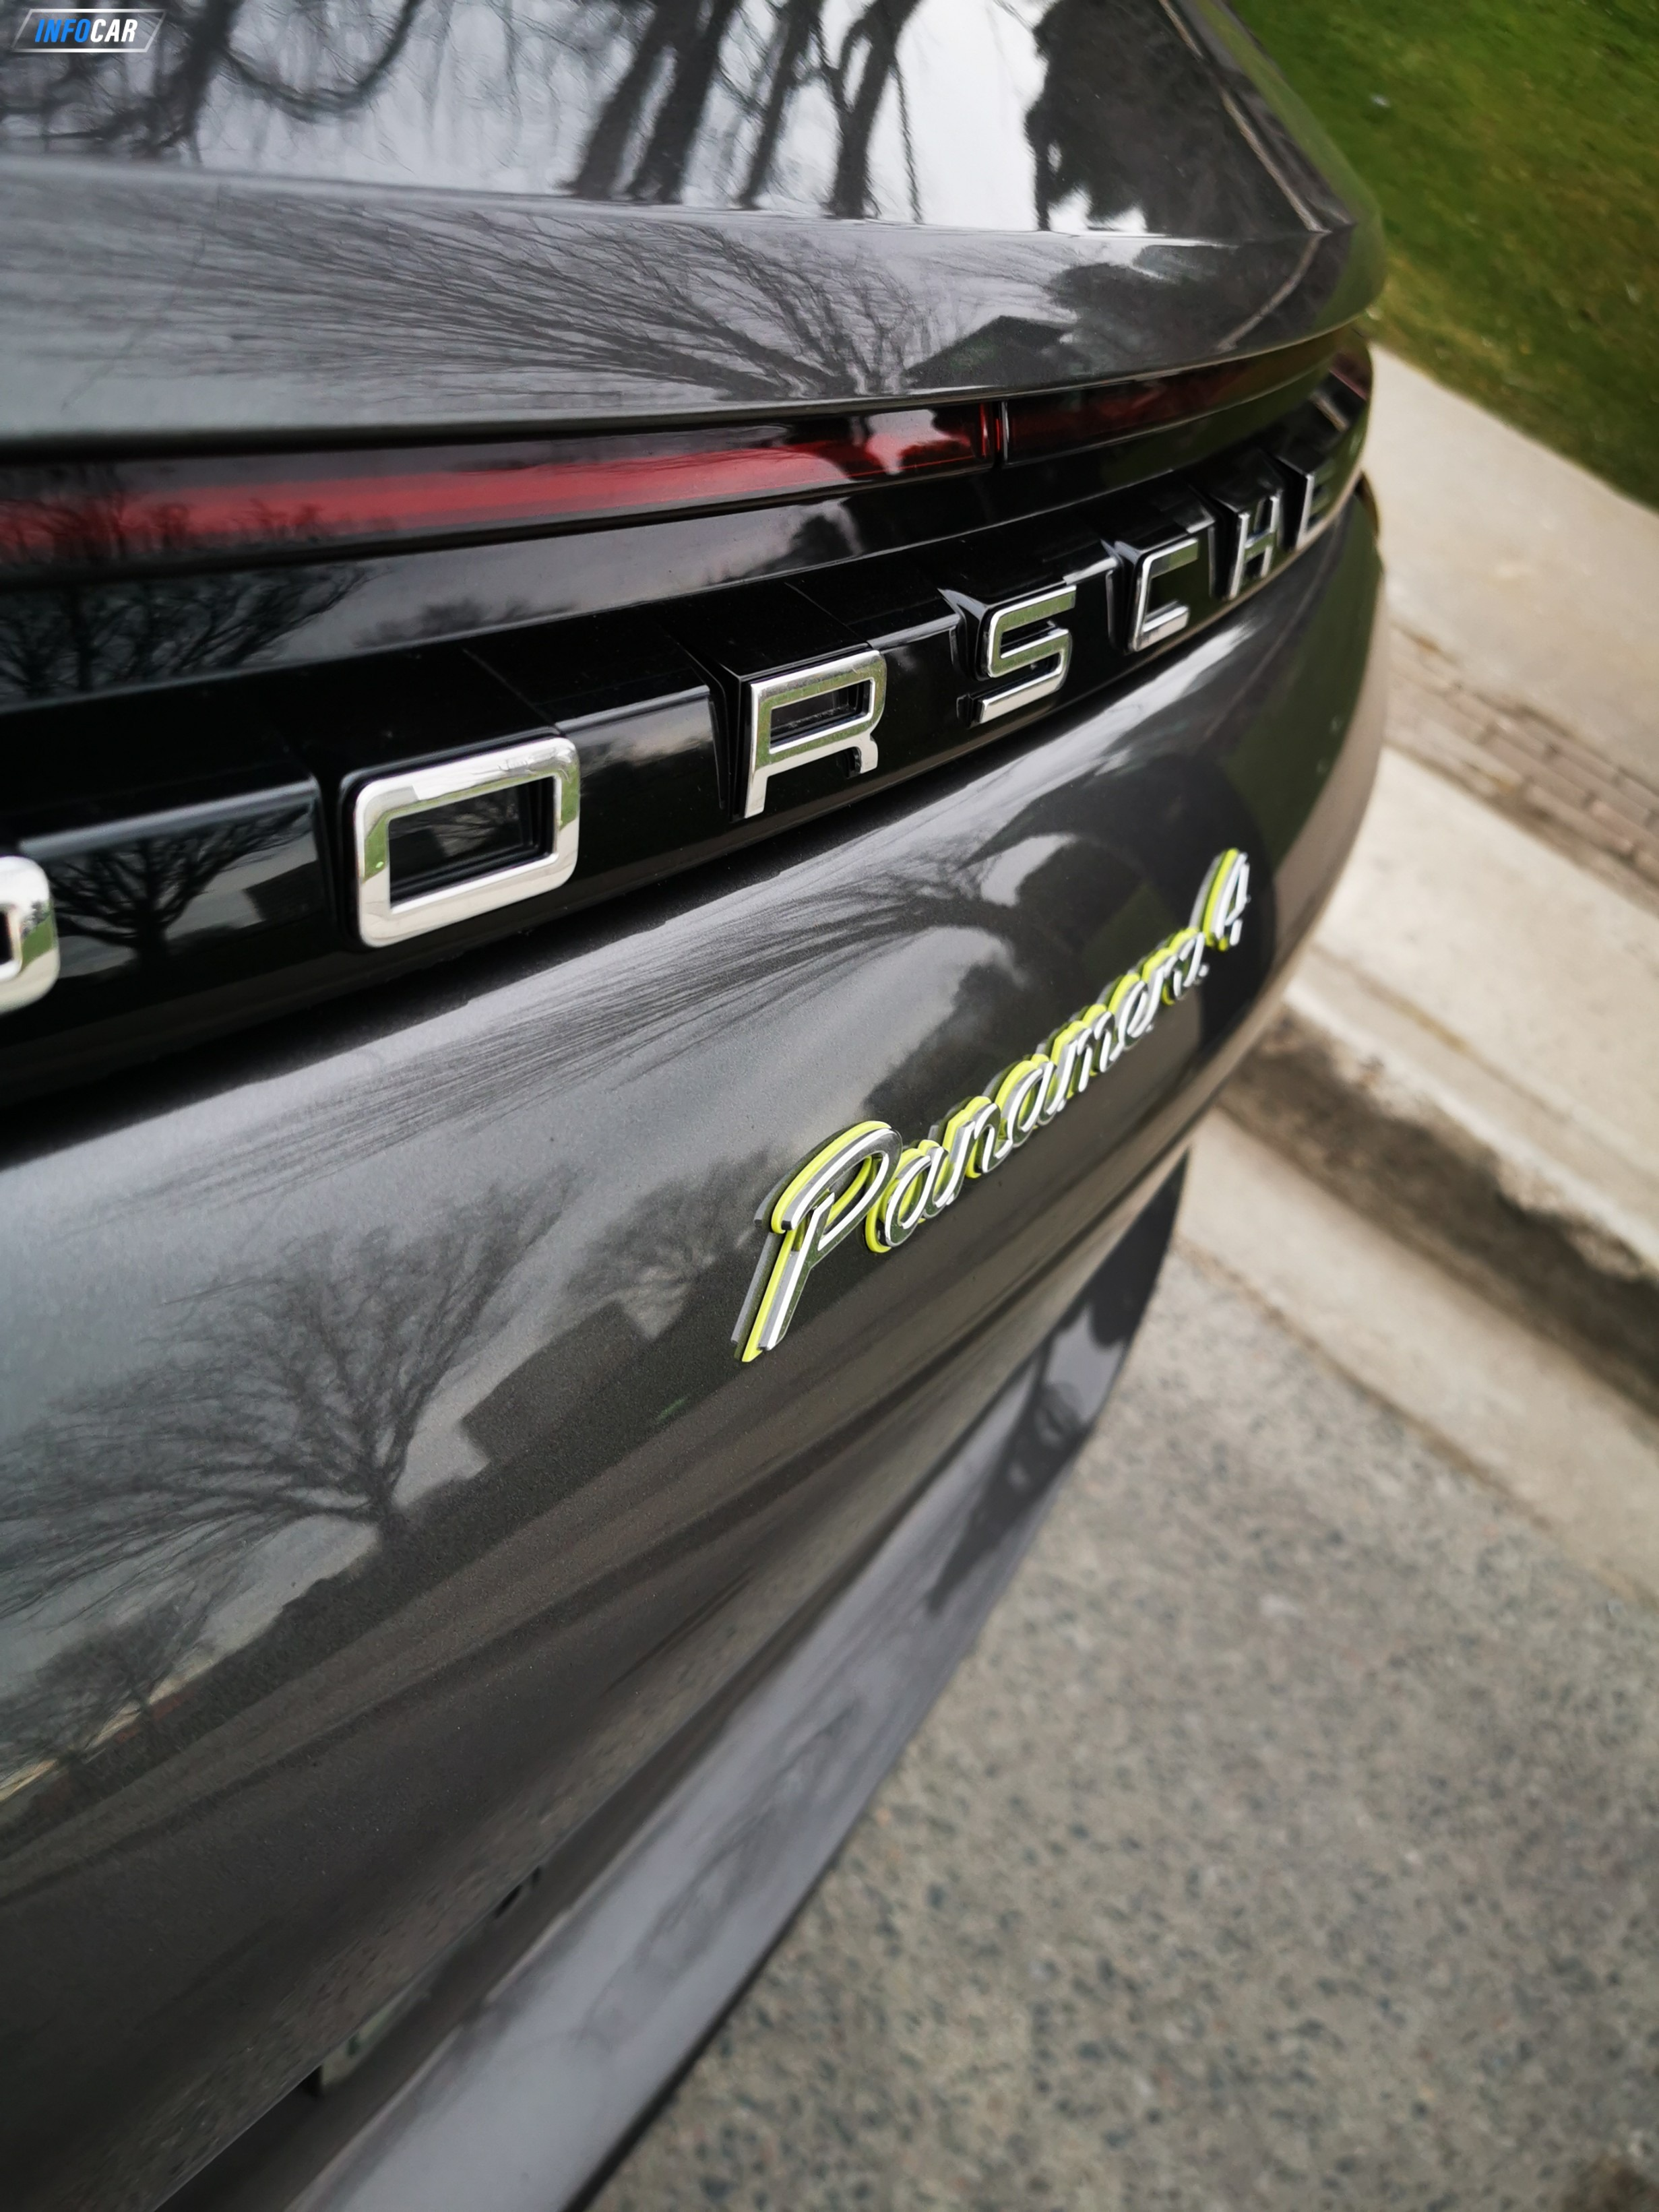 2018 Porsche Panamera Hybrid 4 e-hybrid - INFOCAR - Toronto's Most Comprehensive New and Used Auto Trading Platform